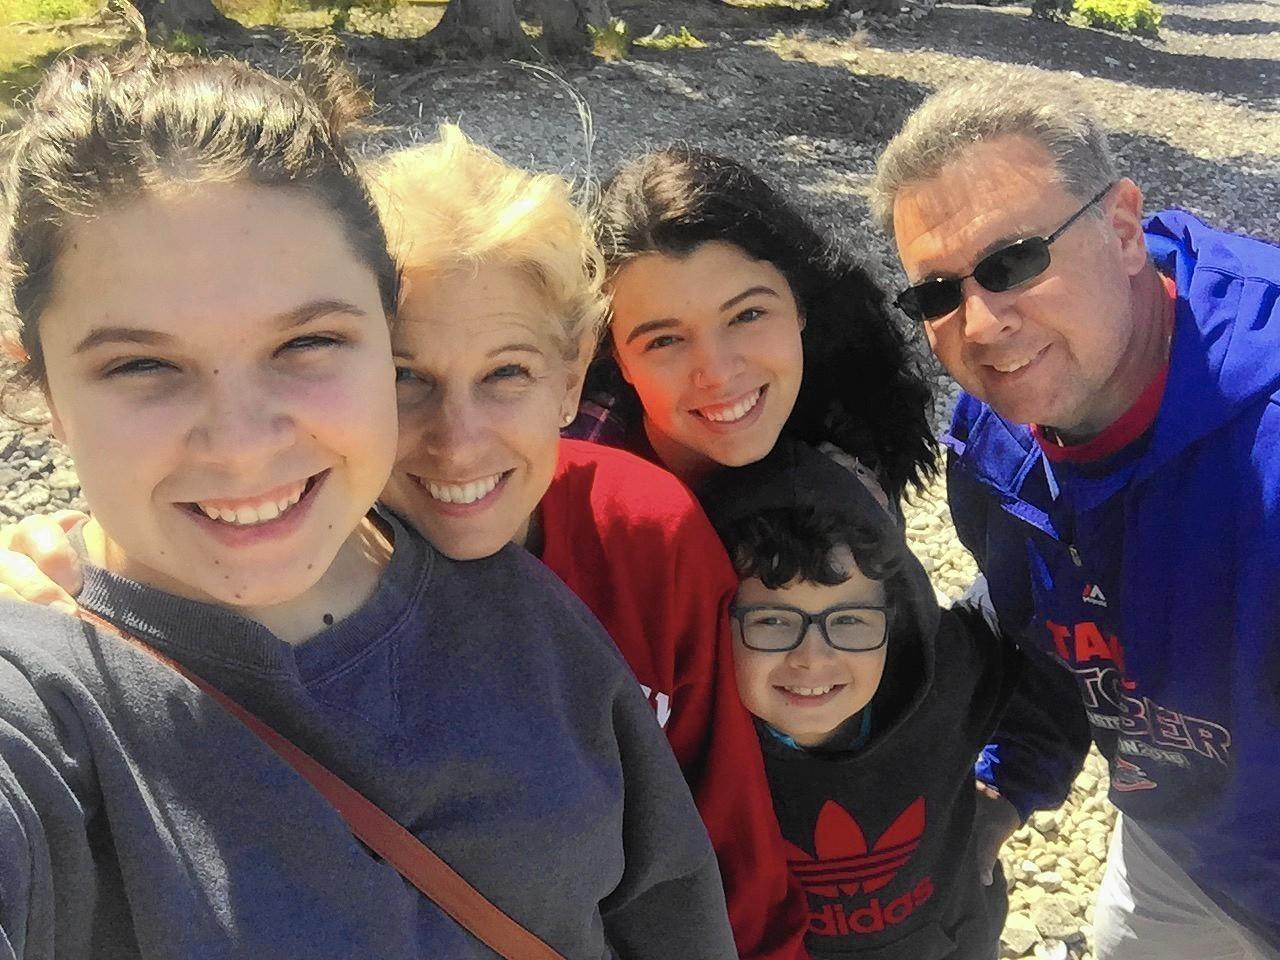 Arlington Heights Family Killed In Car Crash